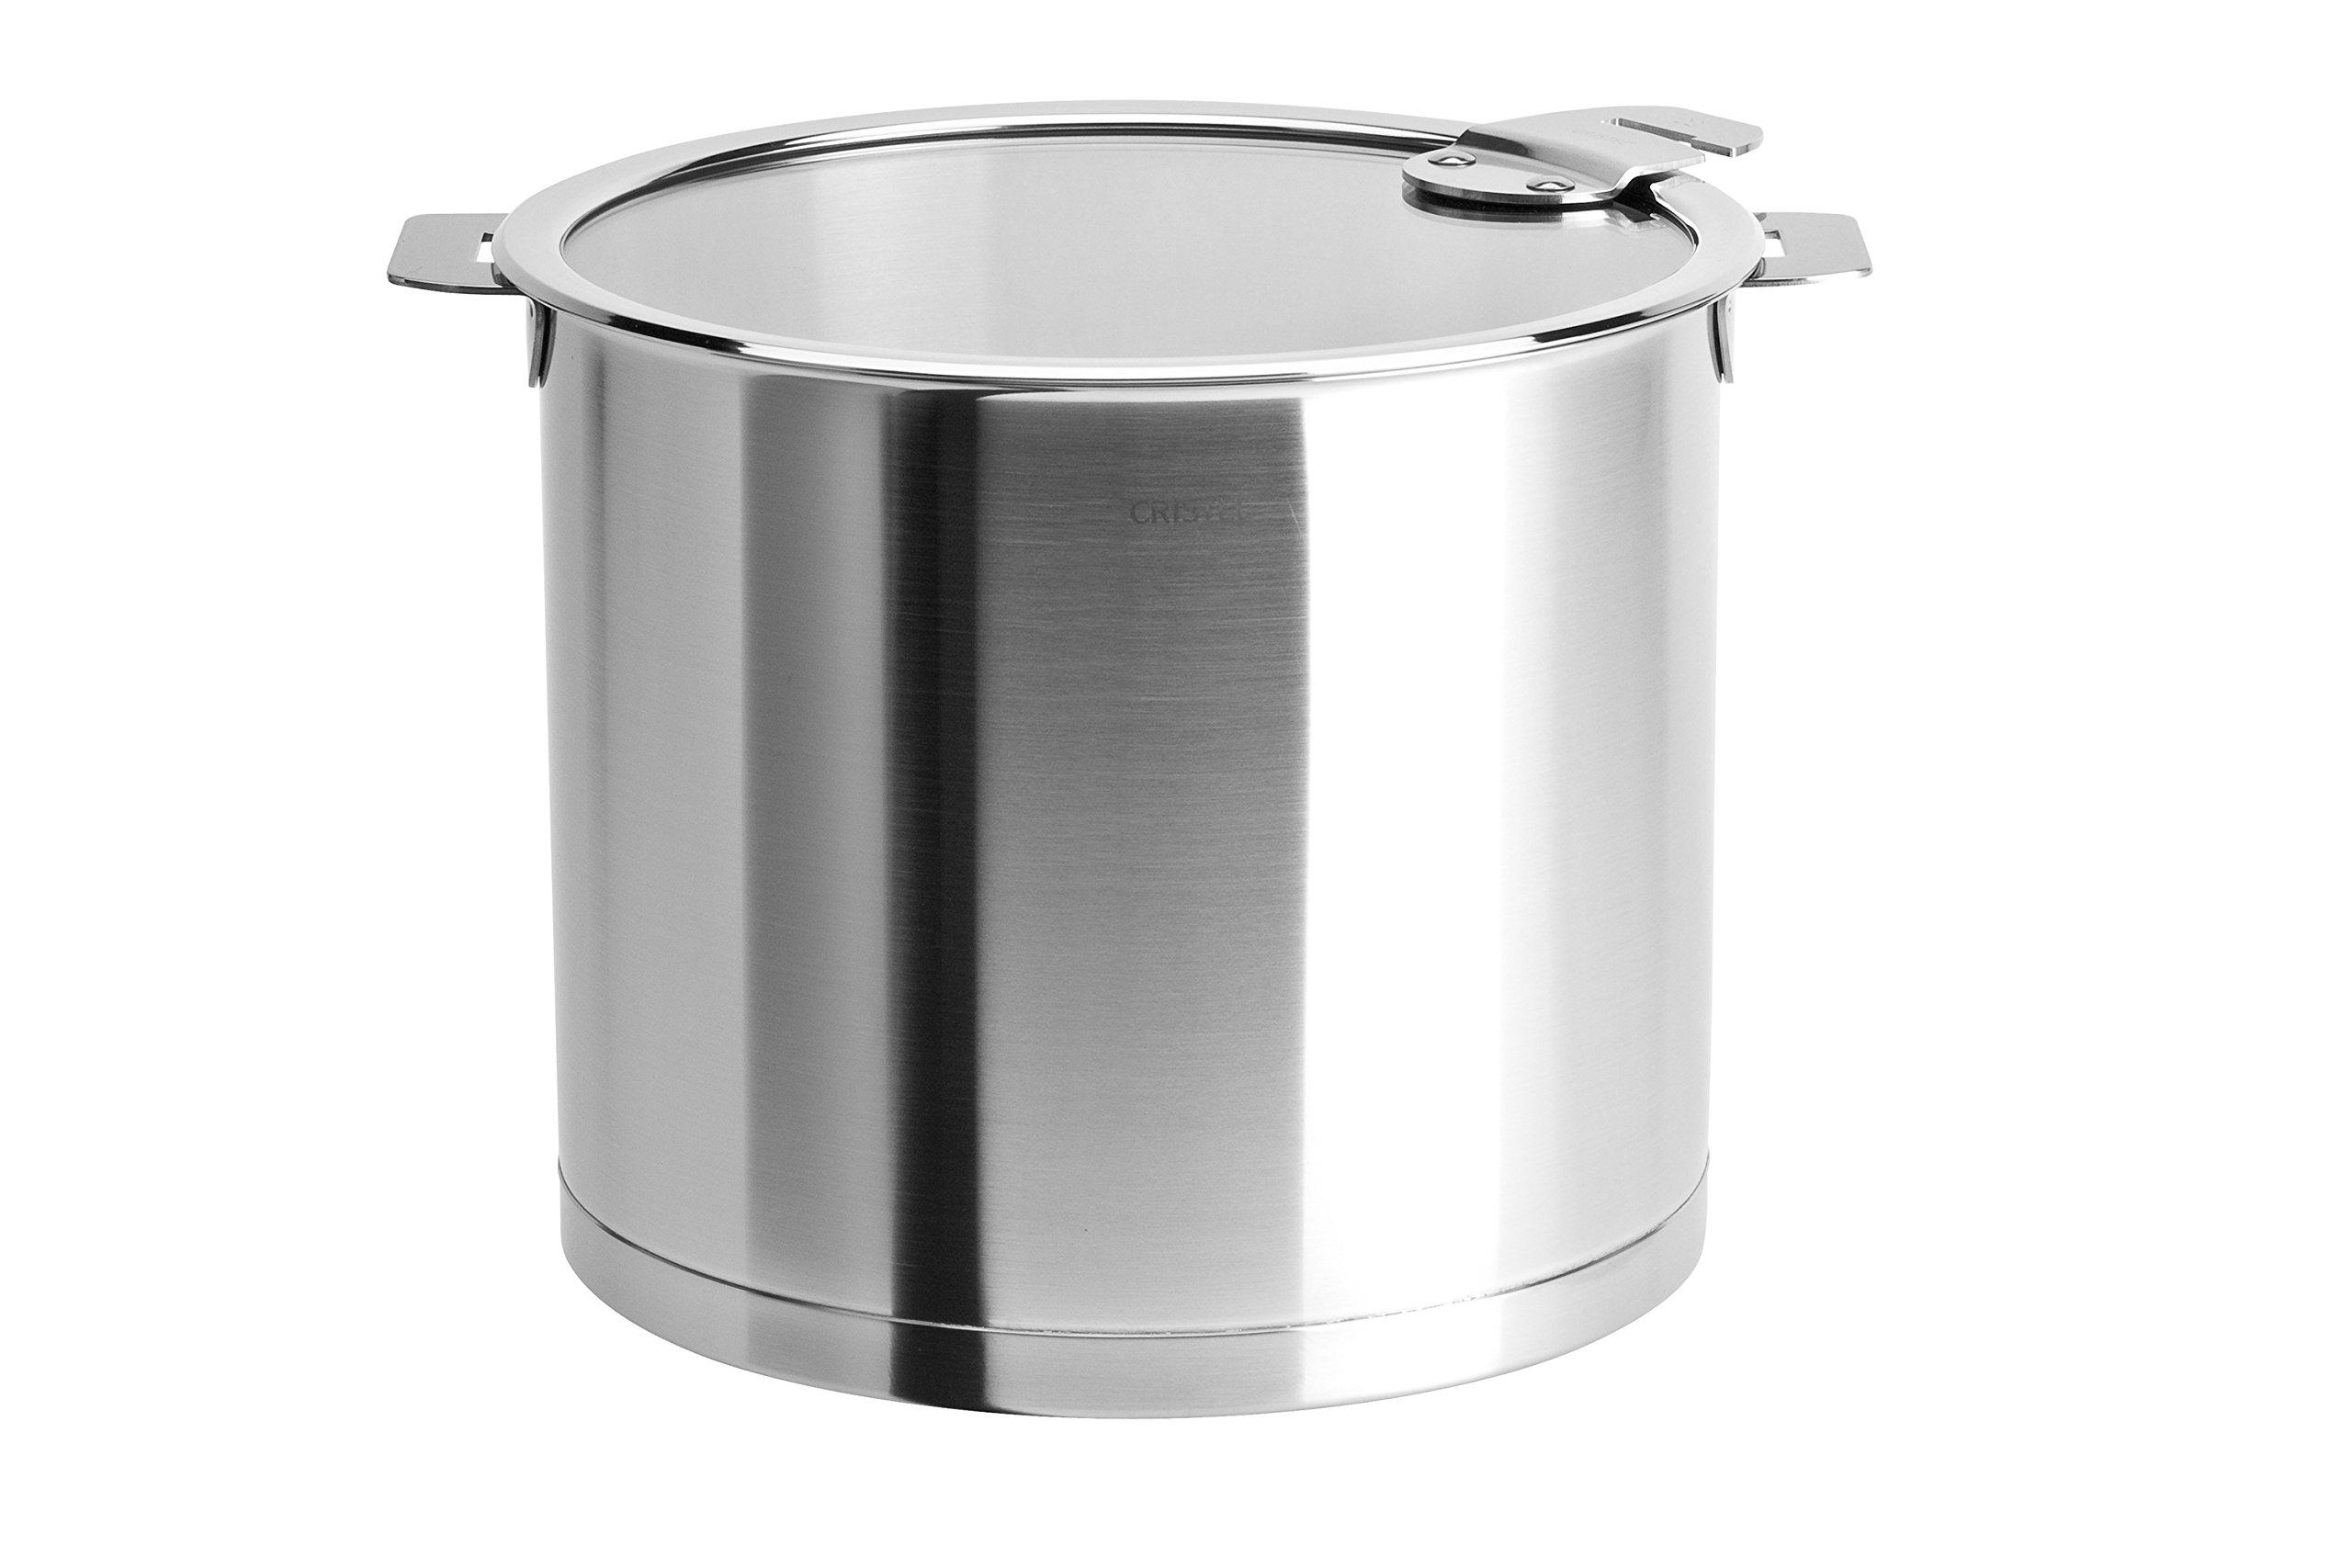 Cristel Strate M20QLKSA Stockpot Silver